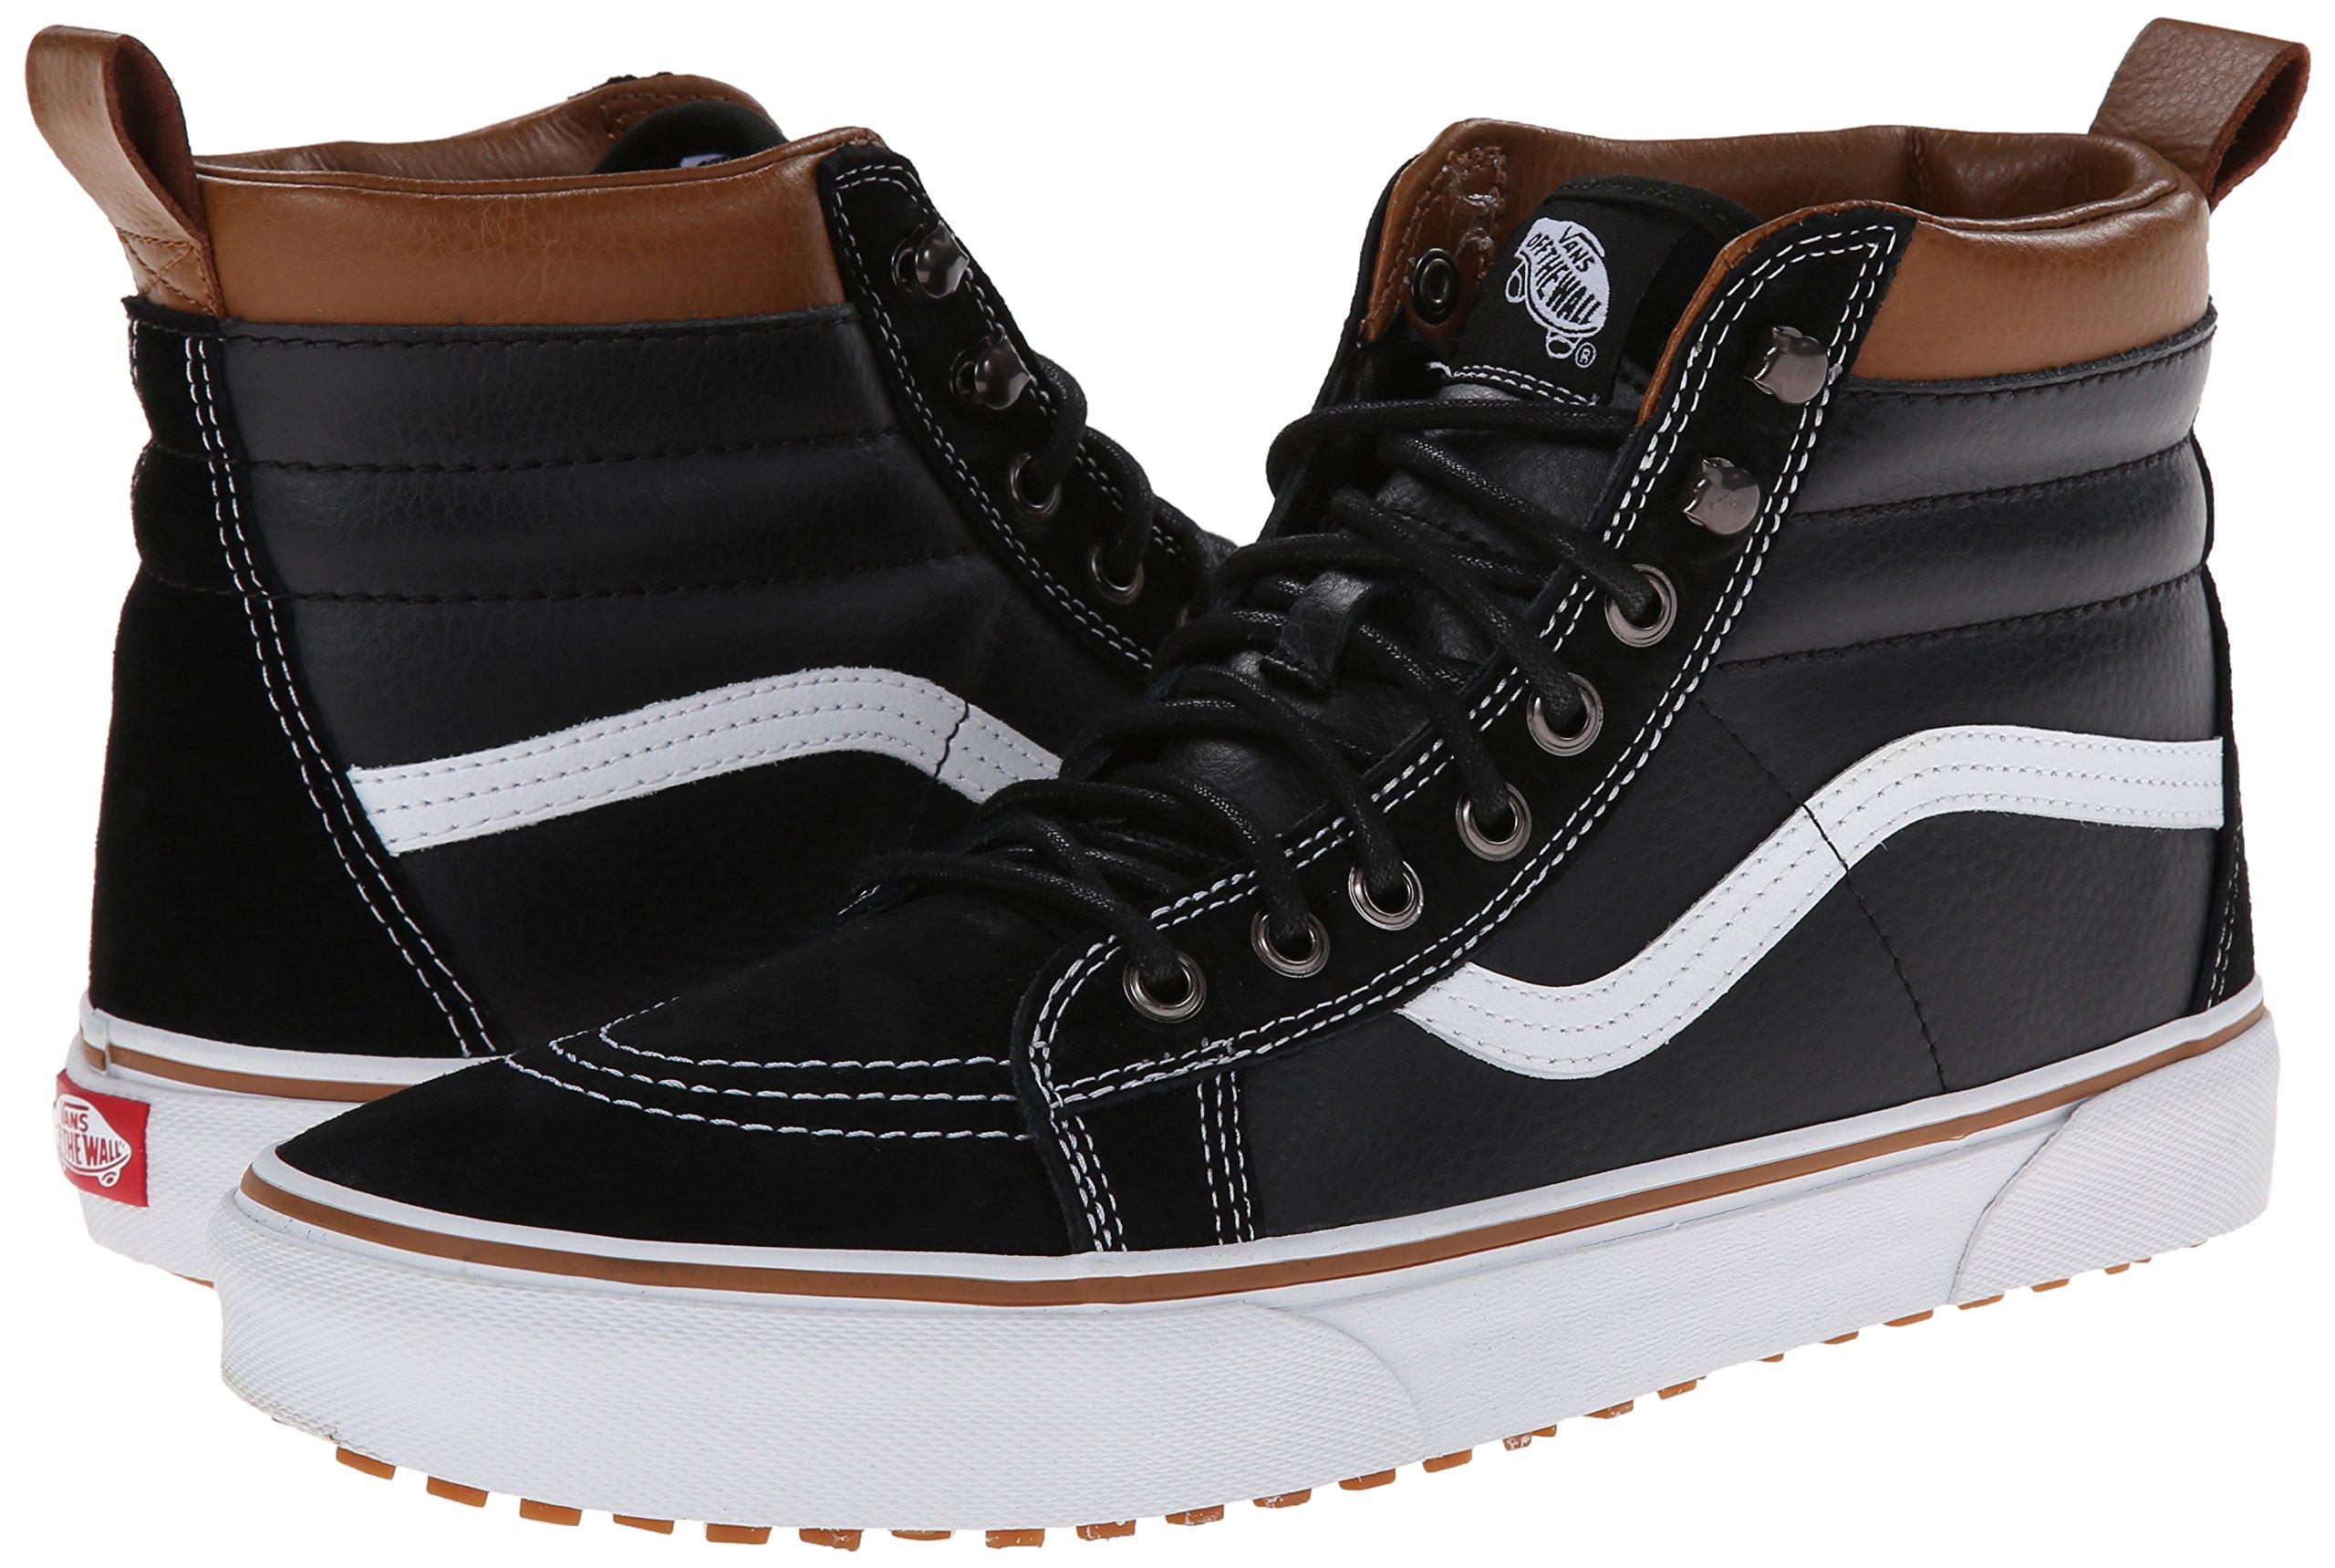 Vans Unisex Sk8-Hi MTE (MTE) Black/True White Skate Shoe 8.5 Men US/10 Women US by Vans (Image #6)